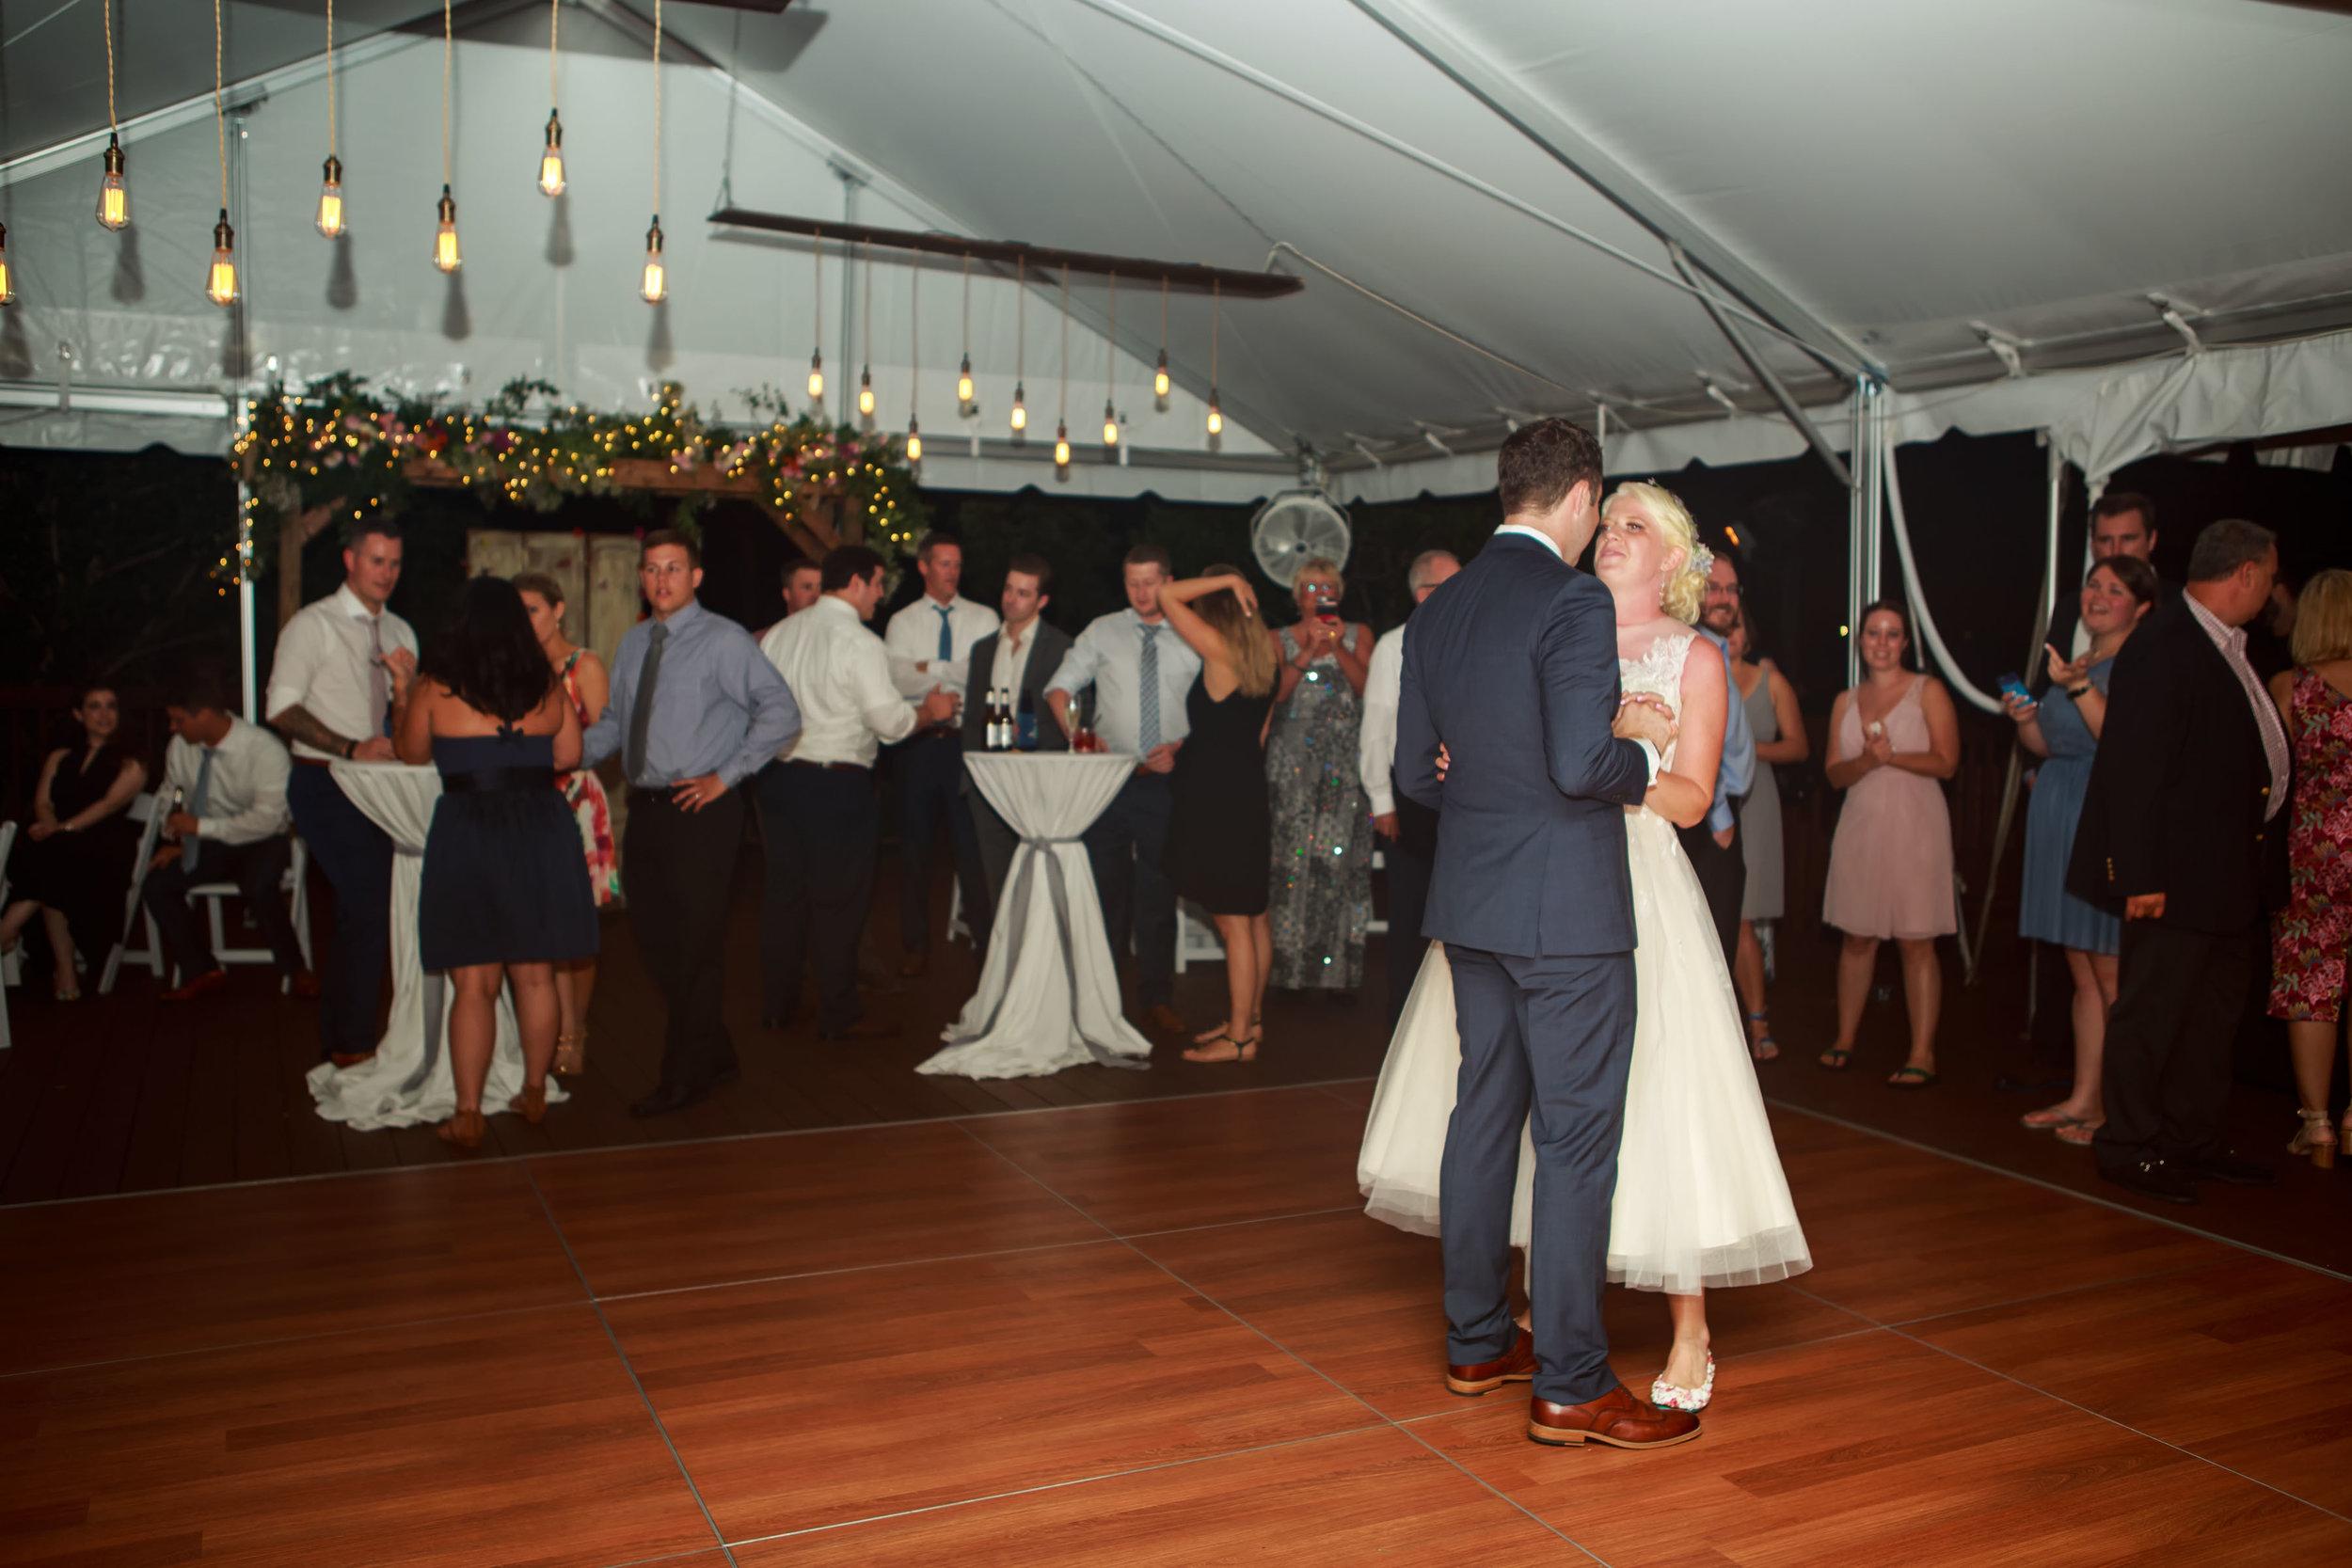 128-South-Wedding-Wilmington-NC-Photographer-Reception-132.jpg